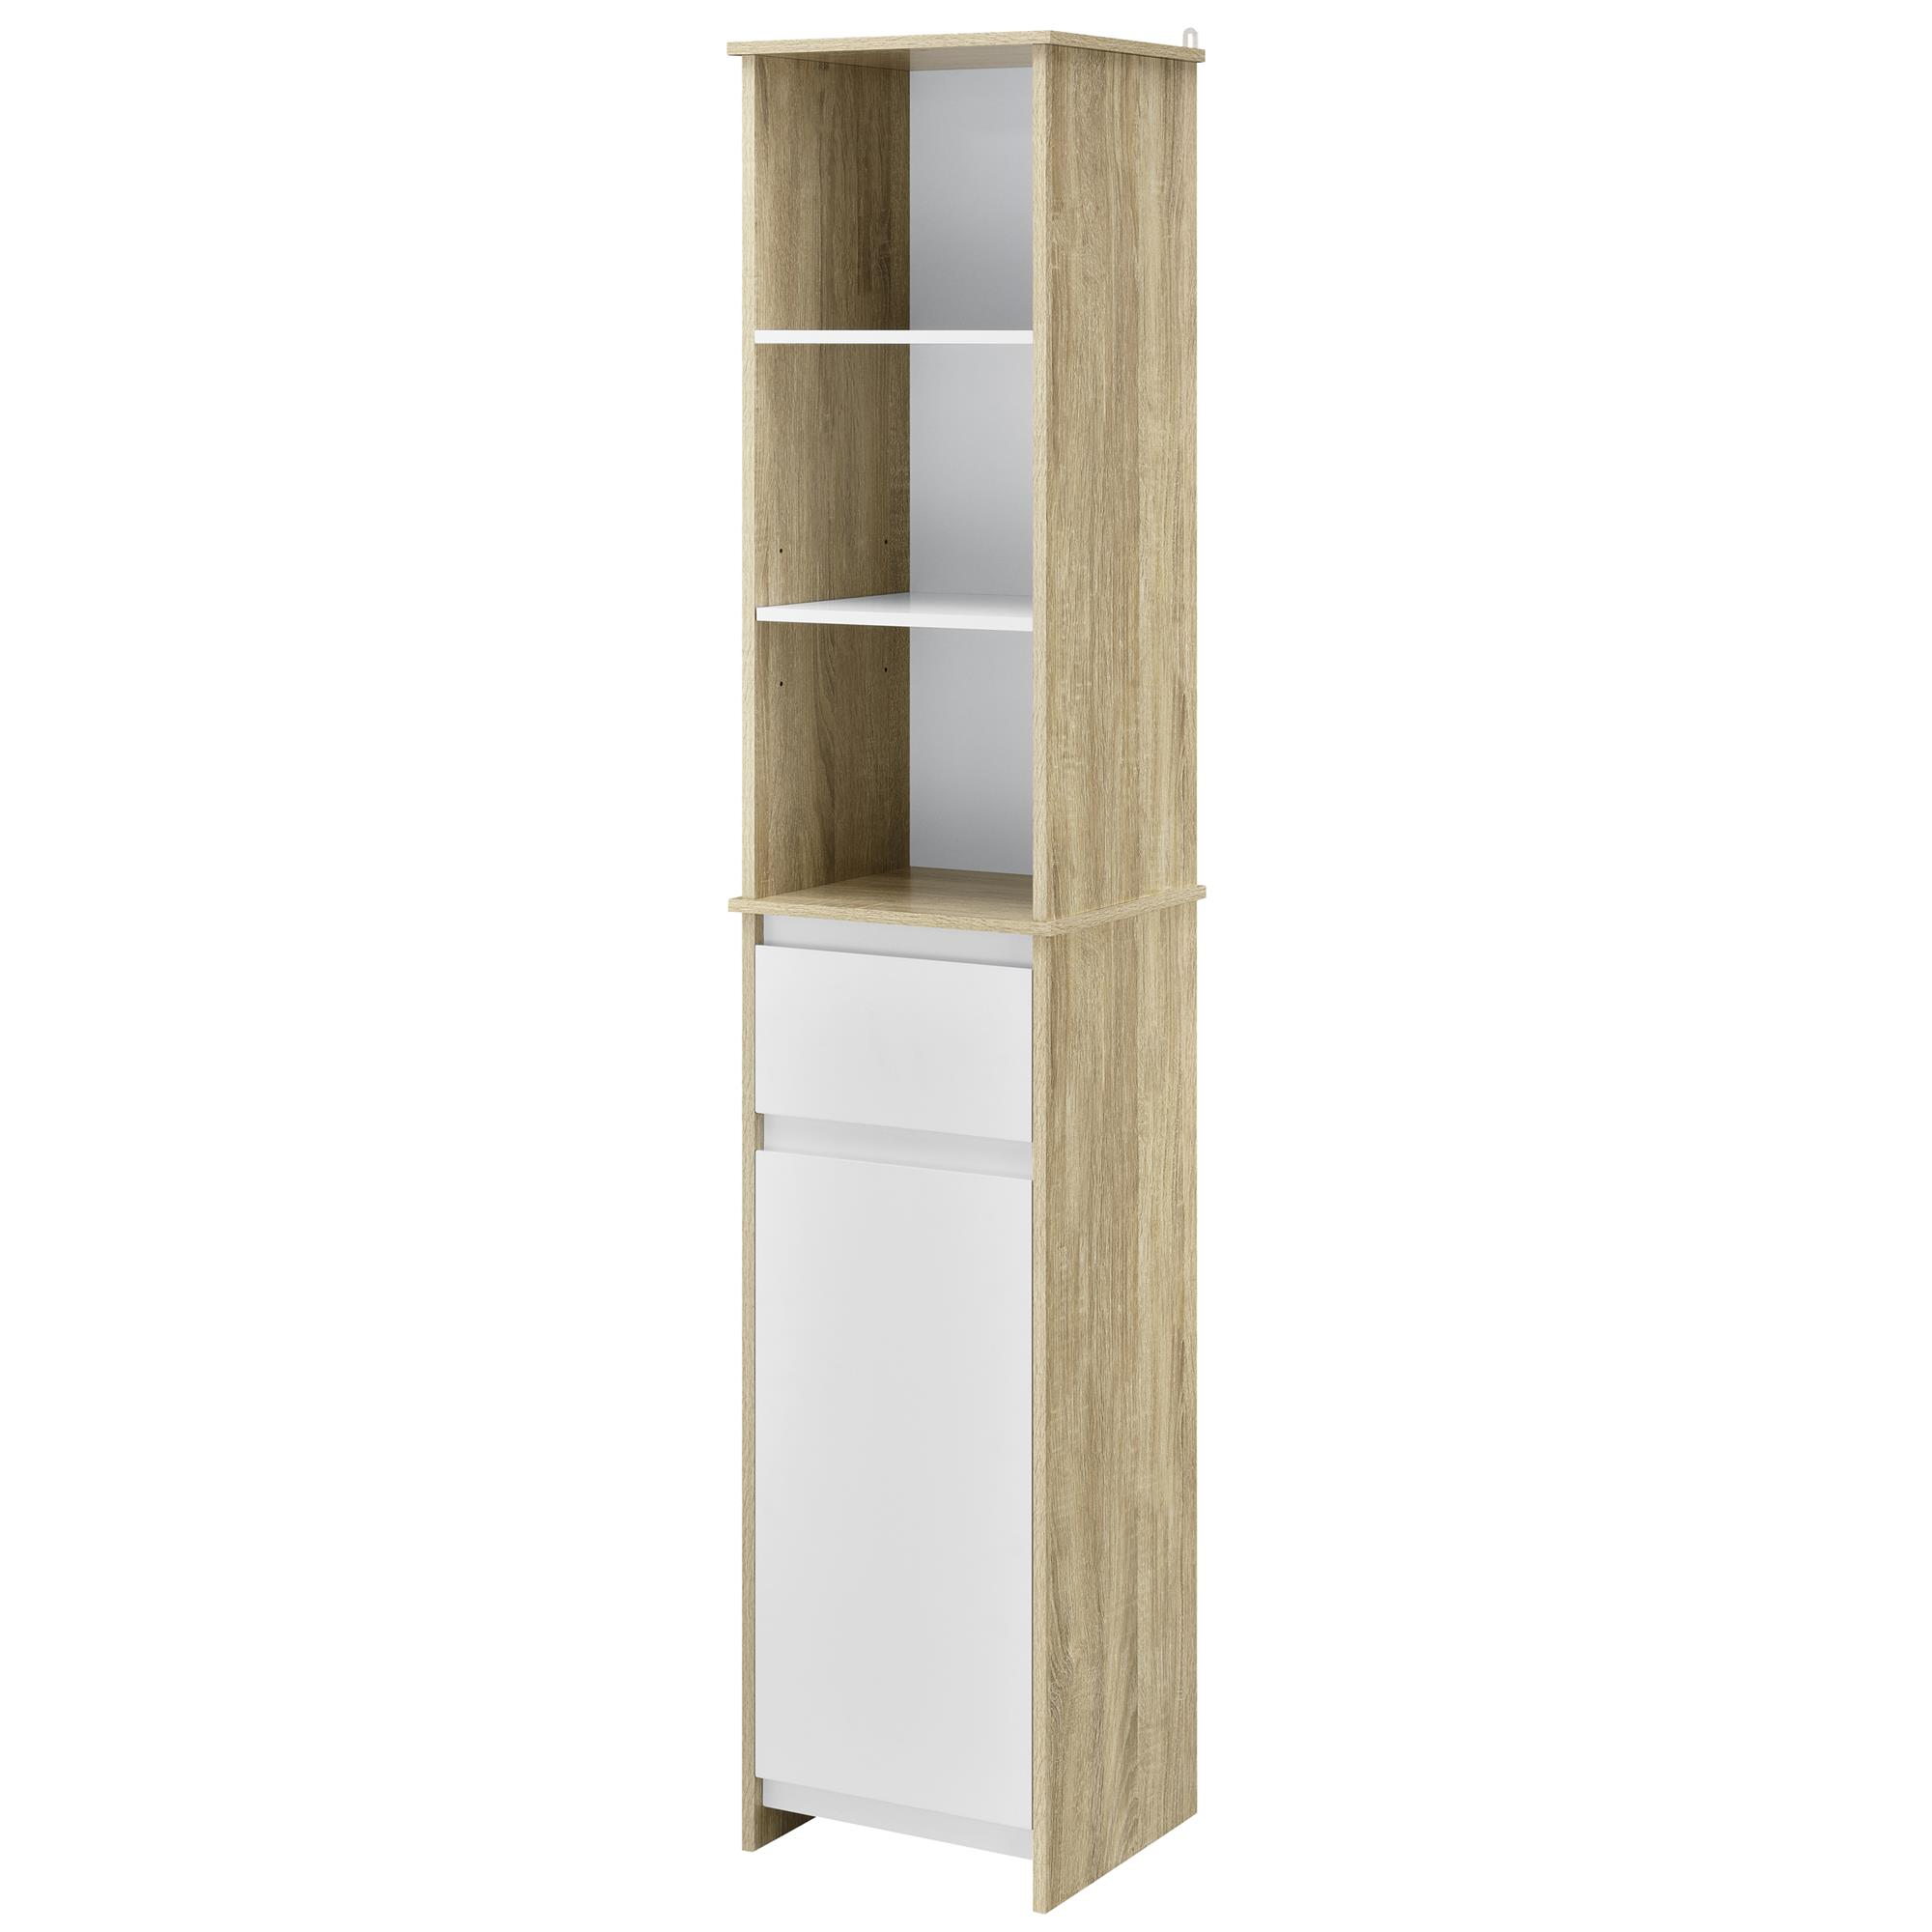 Mainstays Monticlare 3 Tier 1 Door Tall Bathroom Storage Linen Cabinet White Brickseek